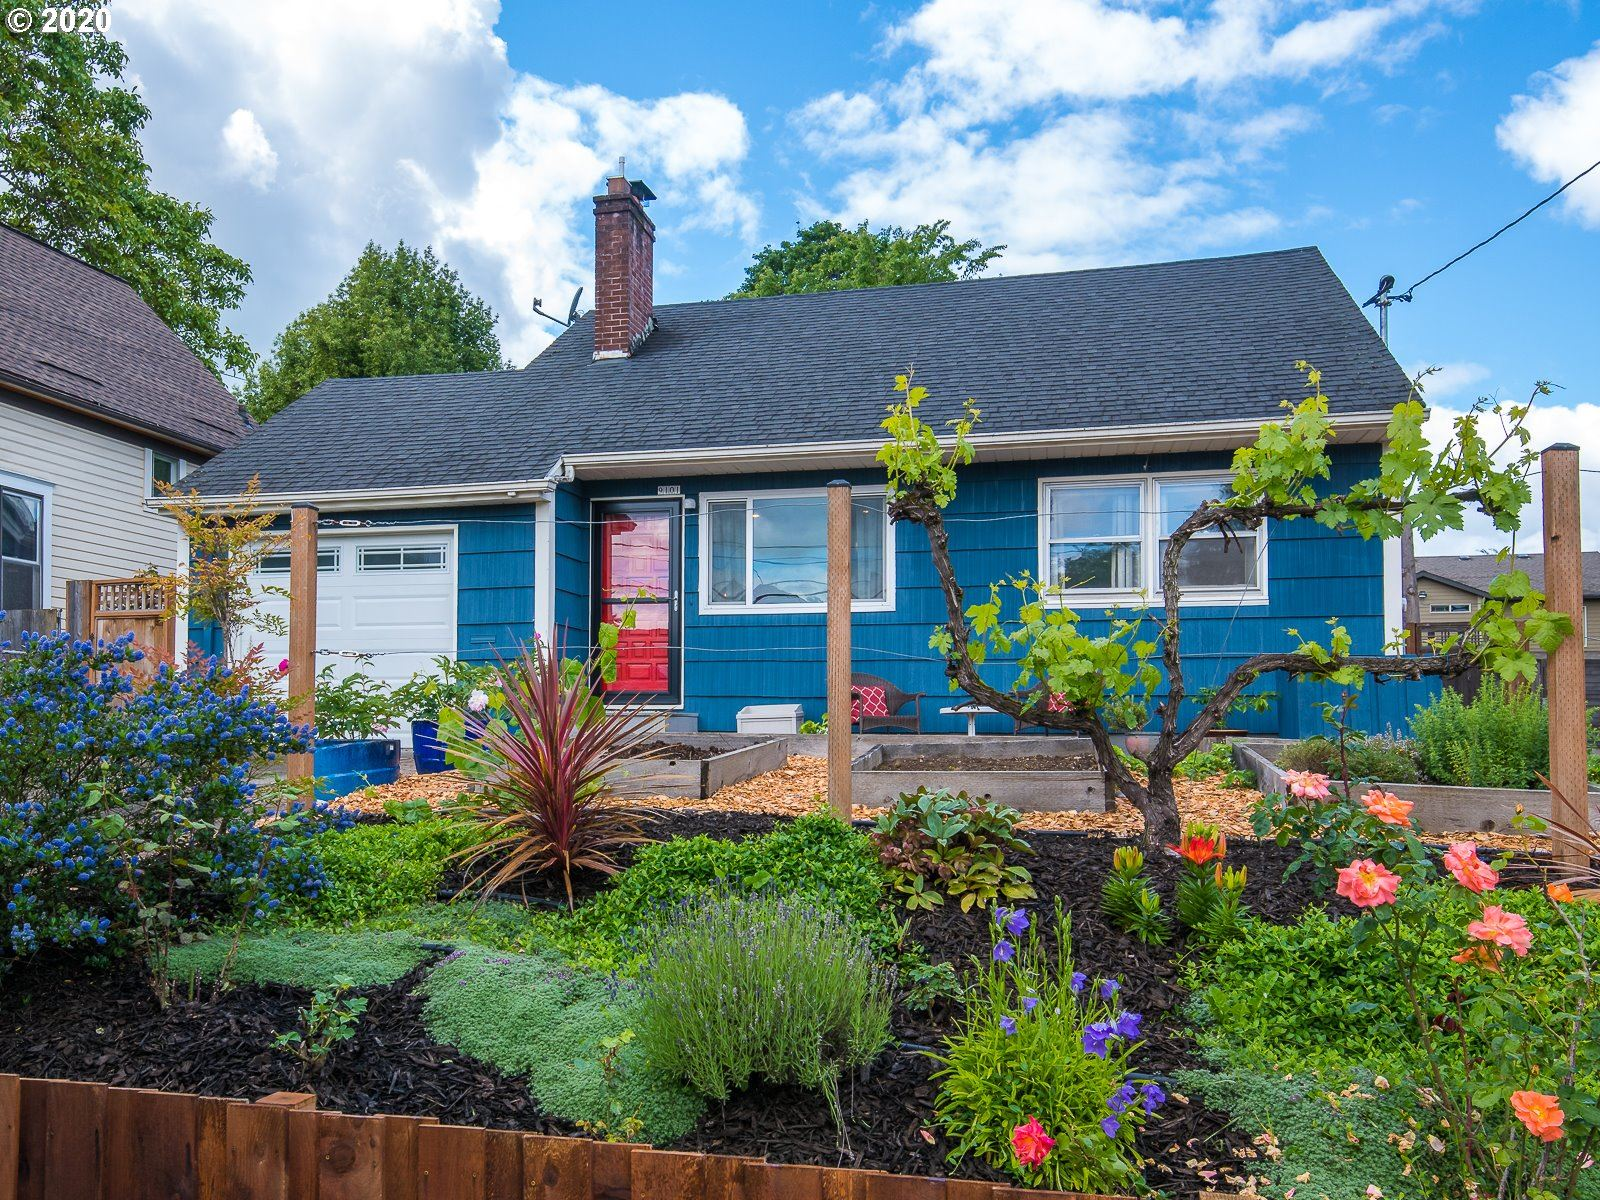 9101 N CHARLESTON AVE, Portland, OR 97203 - MLS#: 20420343